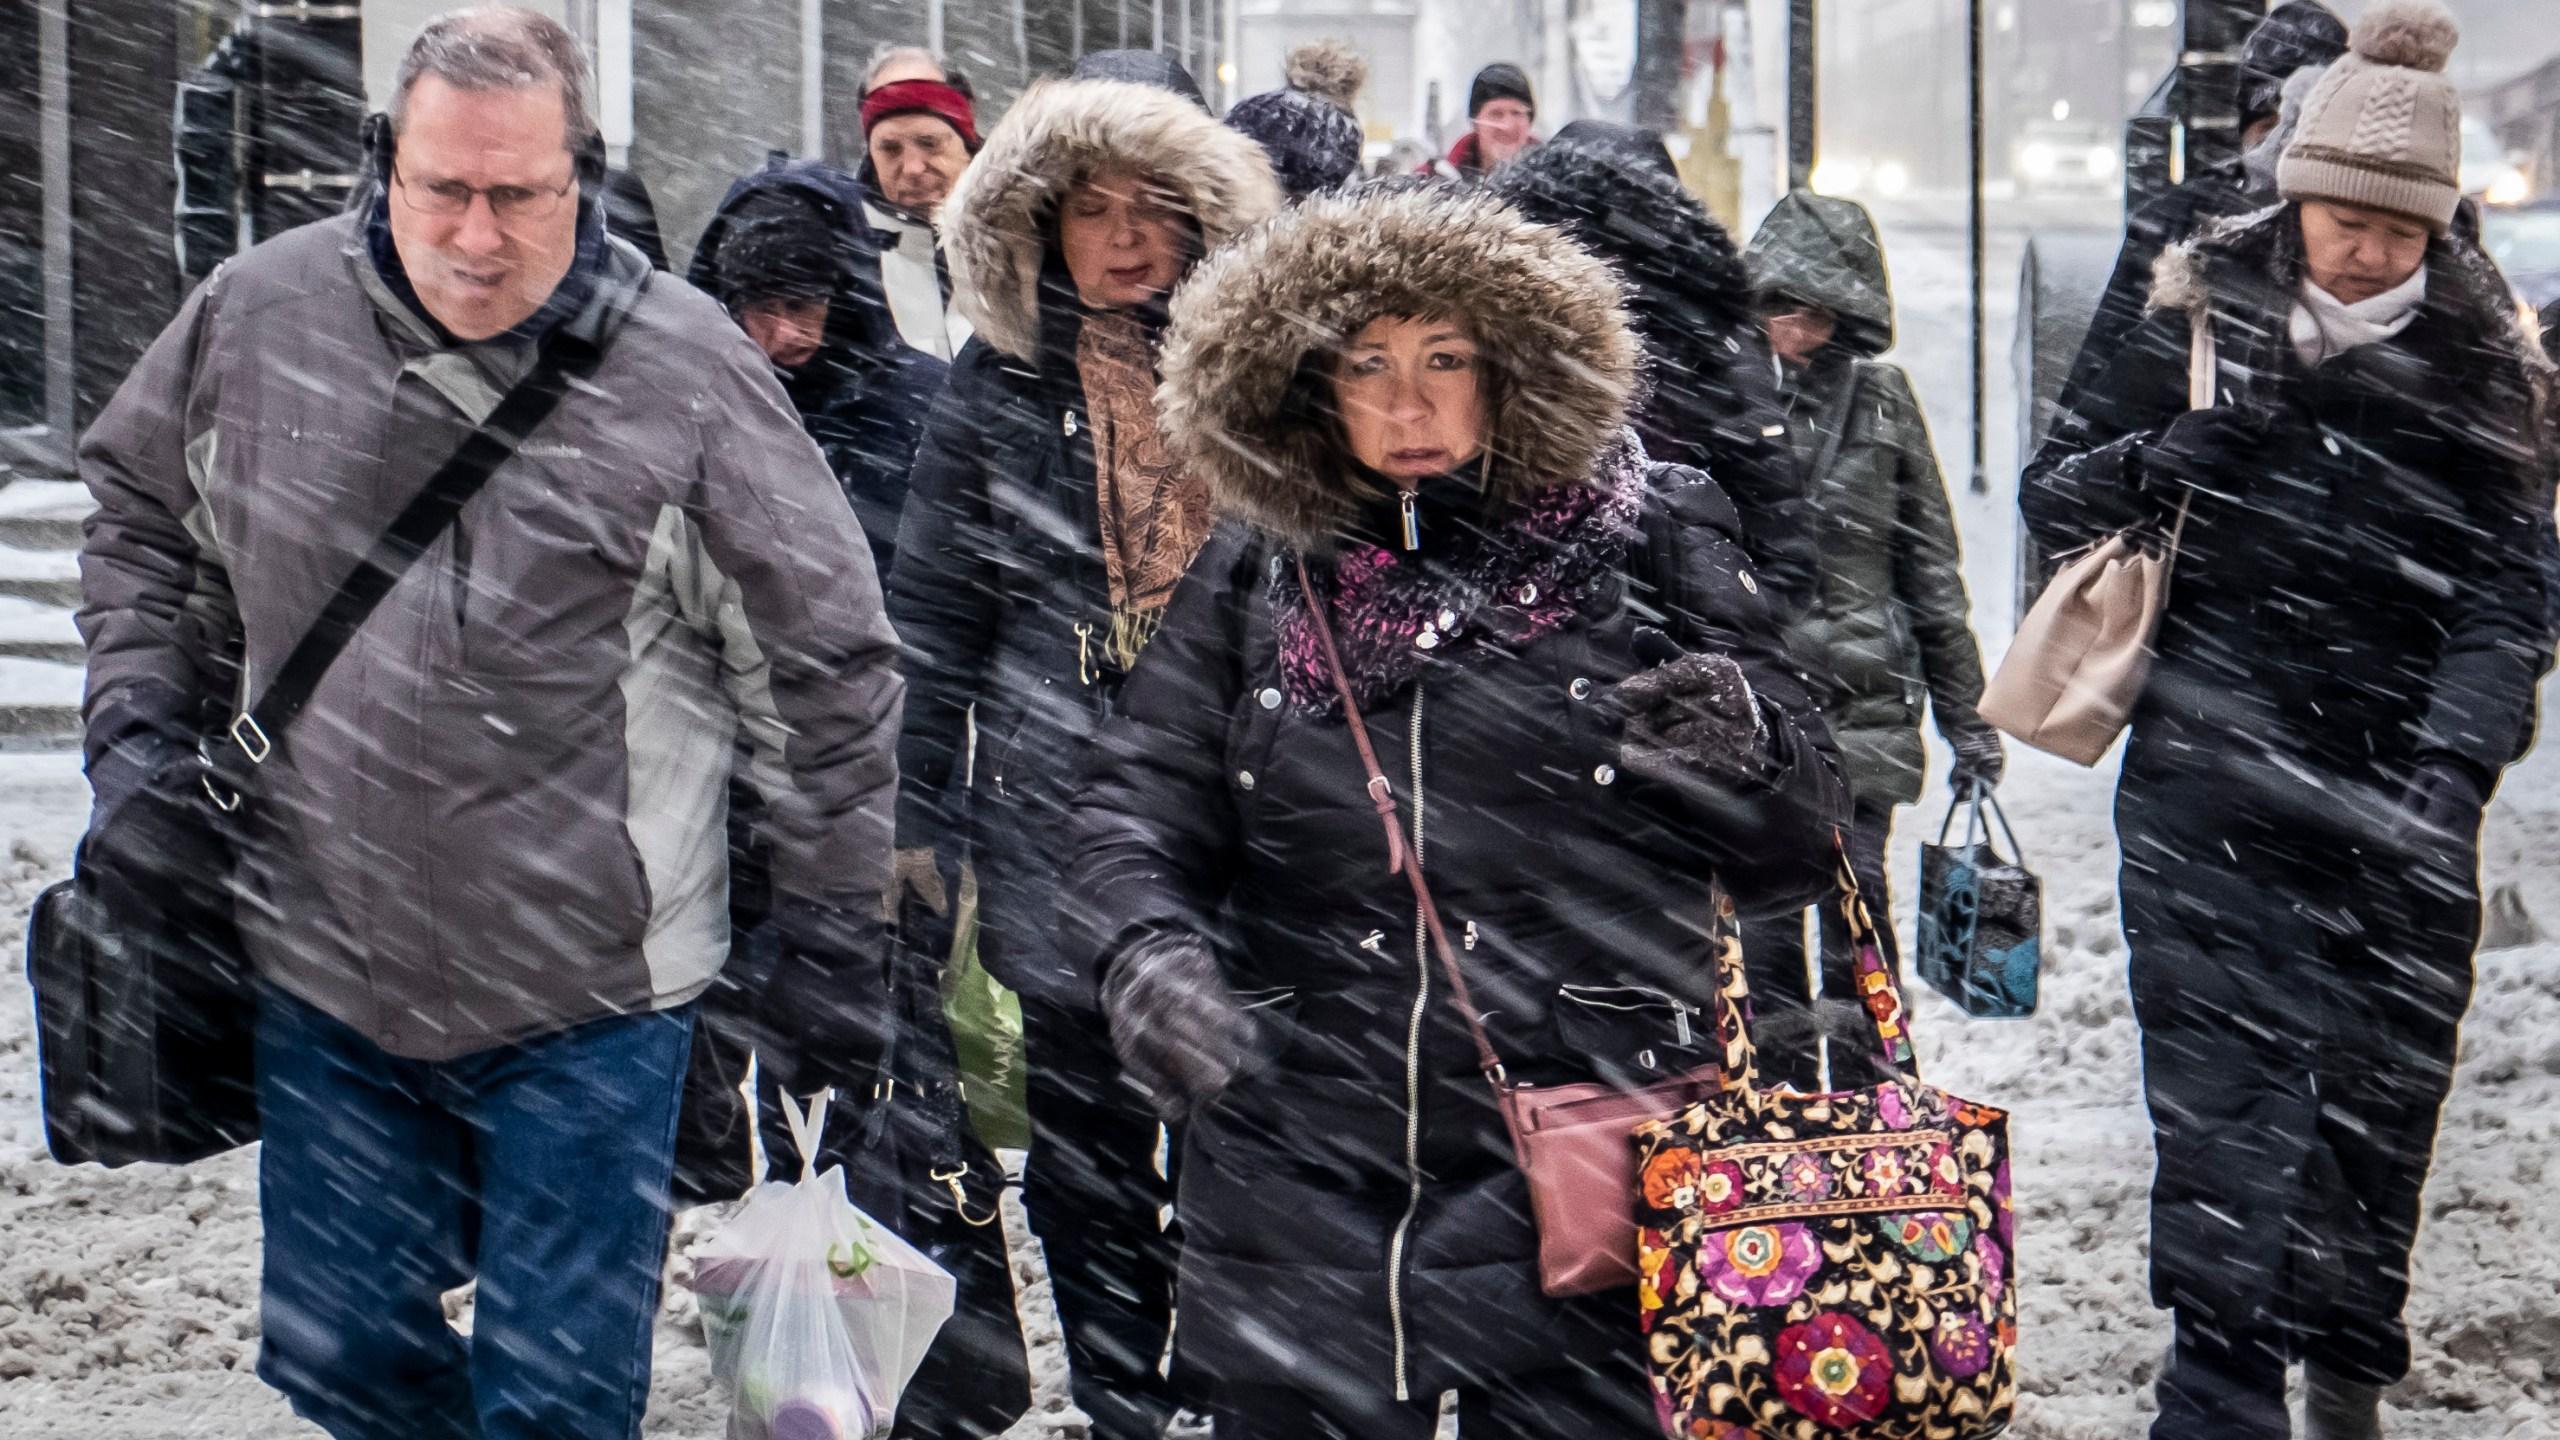 APTOPIX_Winter_Weather_Chicago_59103-159532.jpg02404971